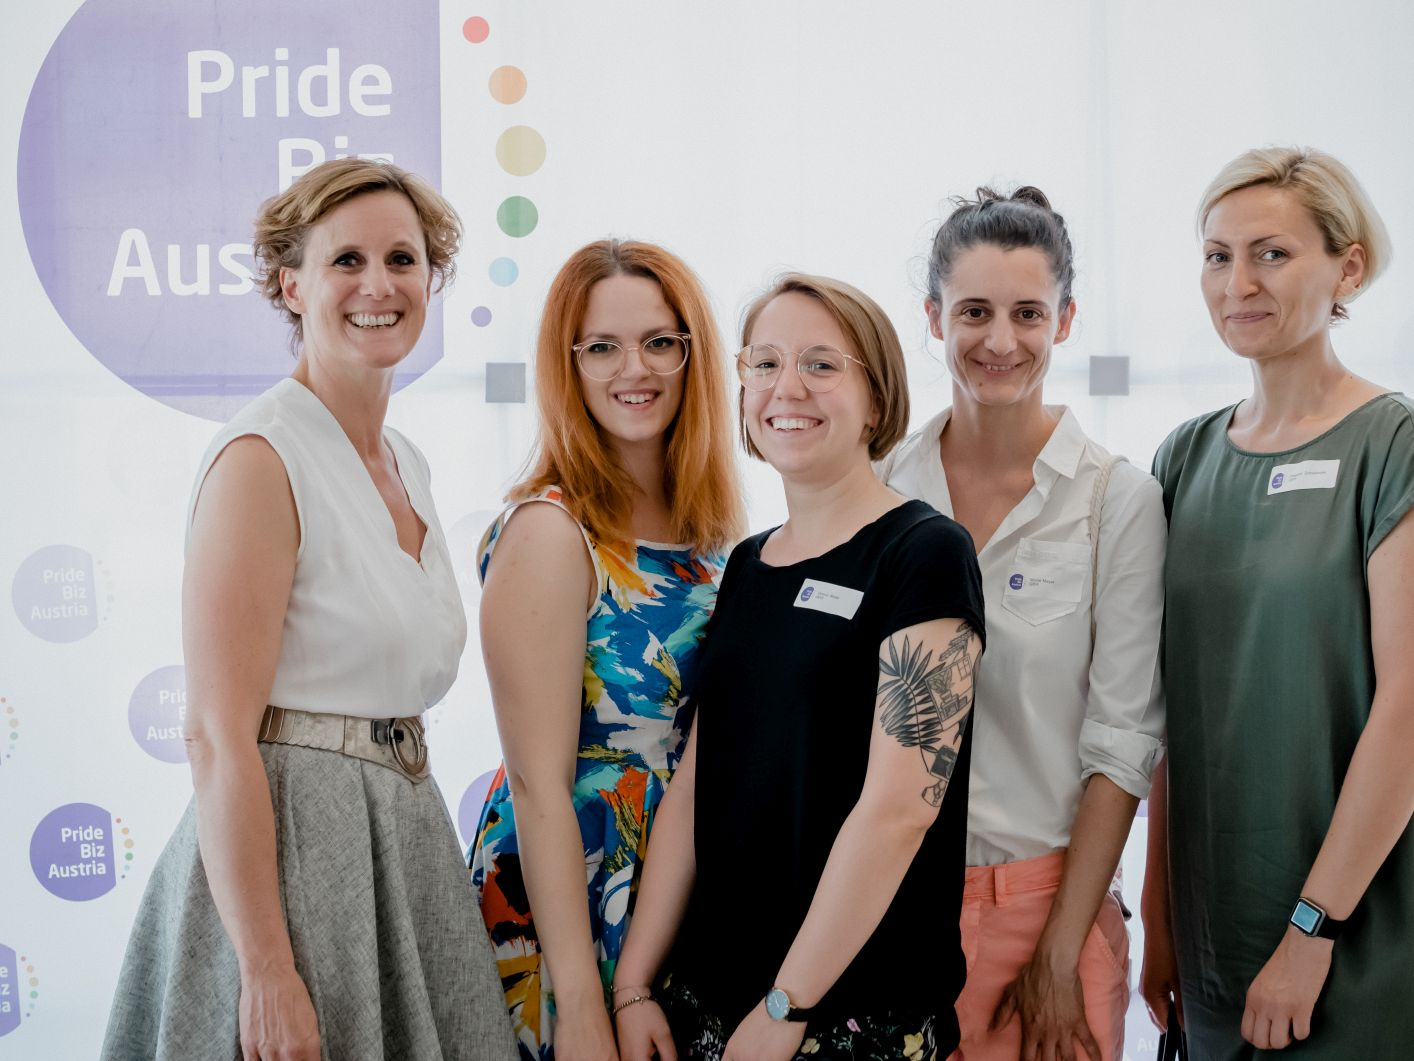 PrideBiz_PrideNetworkingLounge